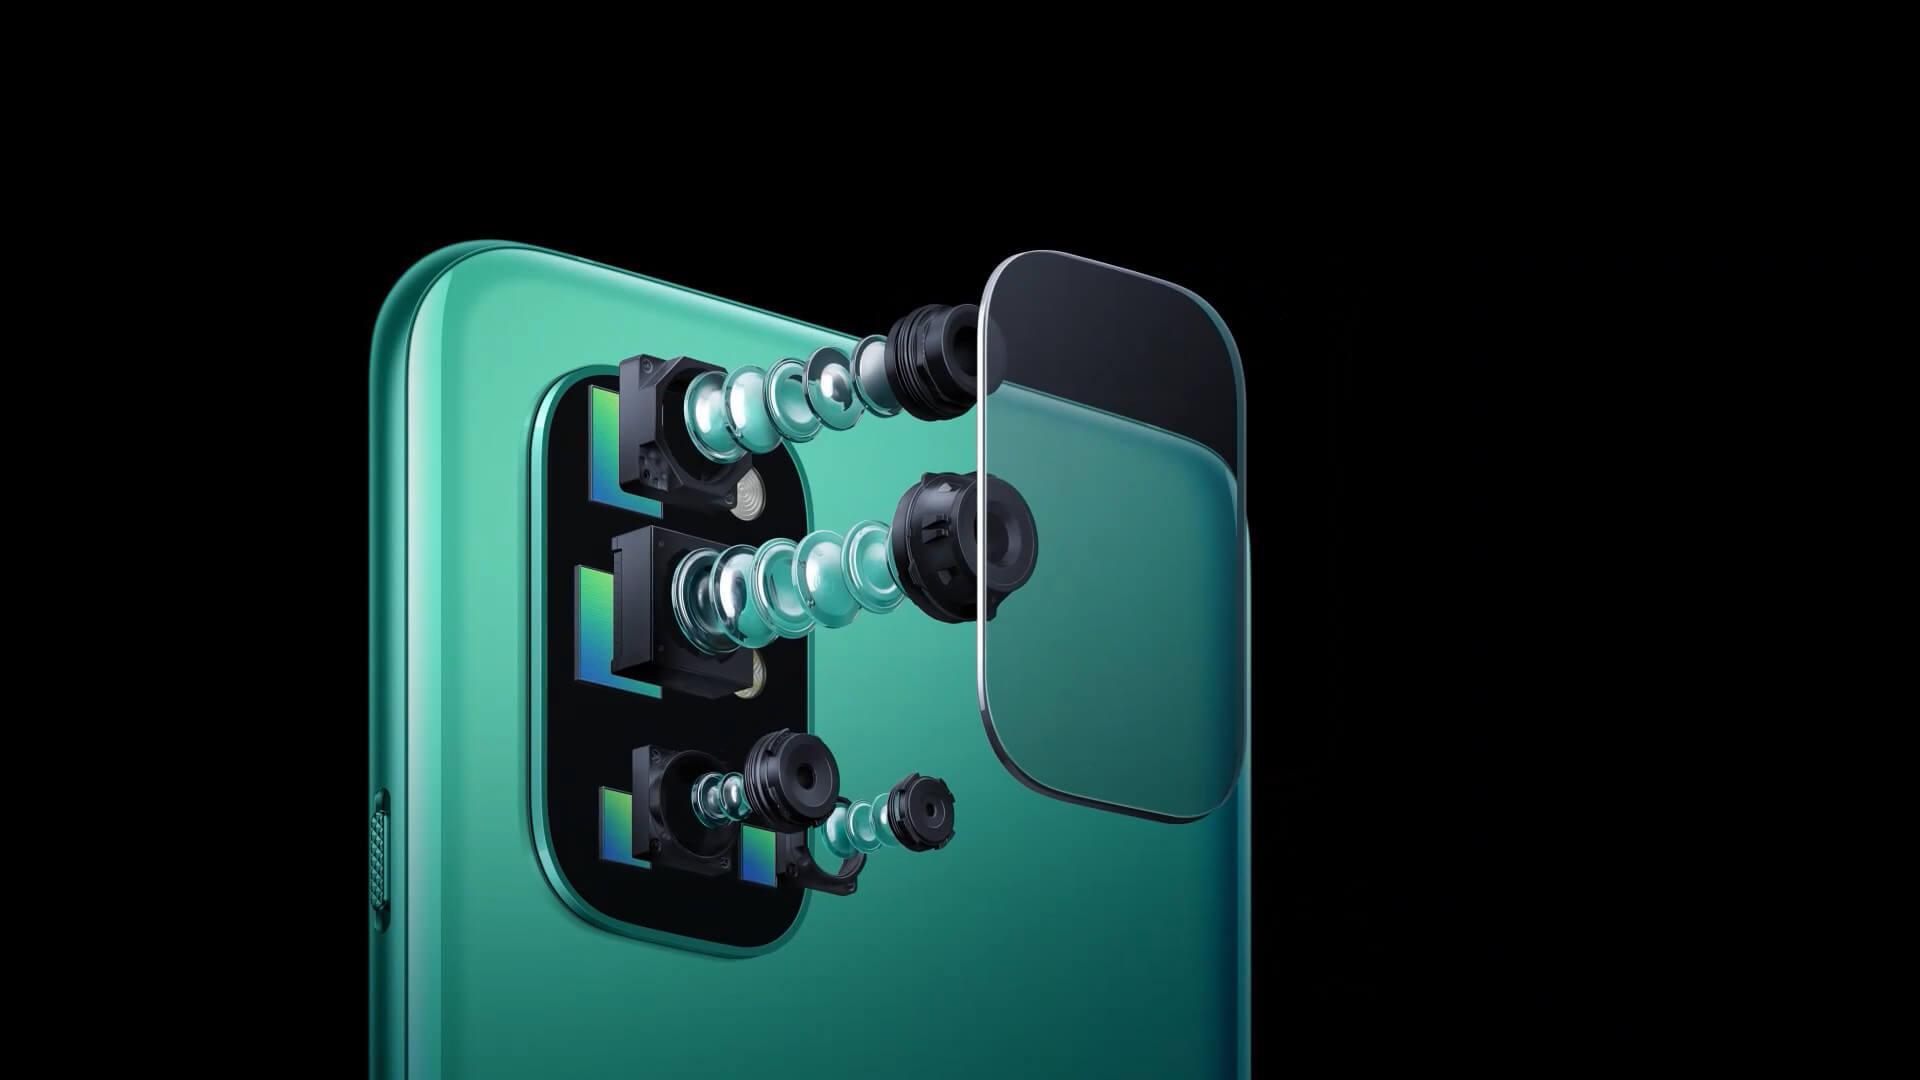 OnePlus 8T camera